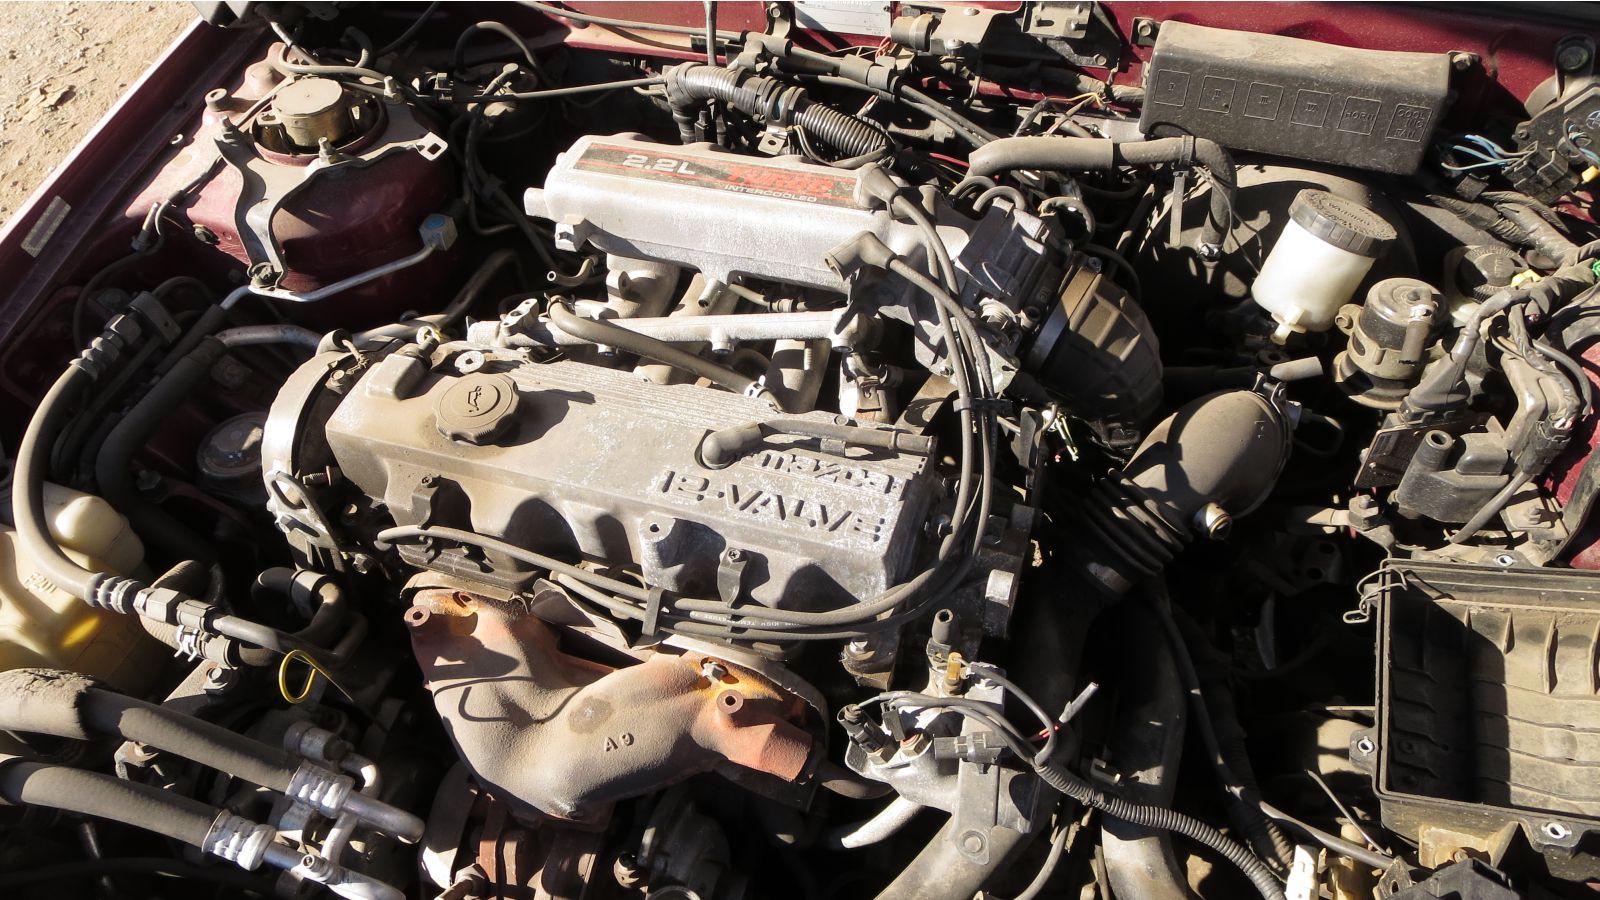 Junkyard Gem: 1989 Mazda MX-6 GT Turbo - Autoblog